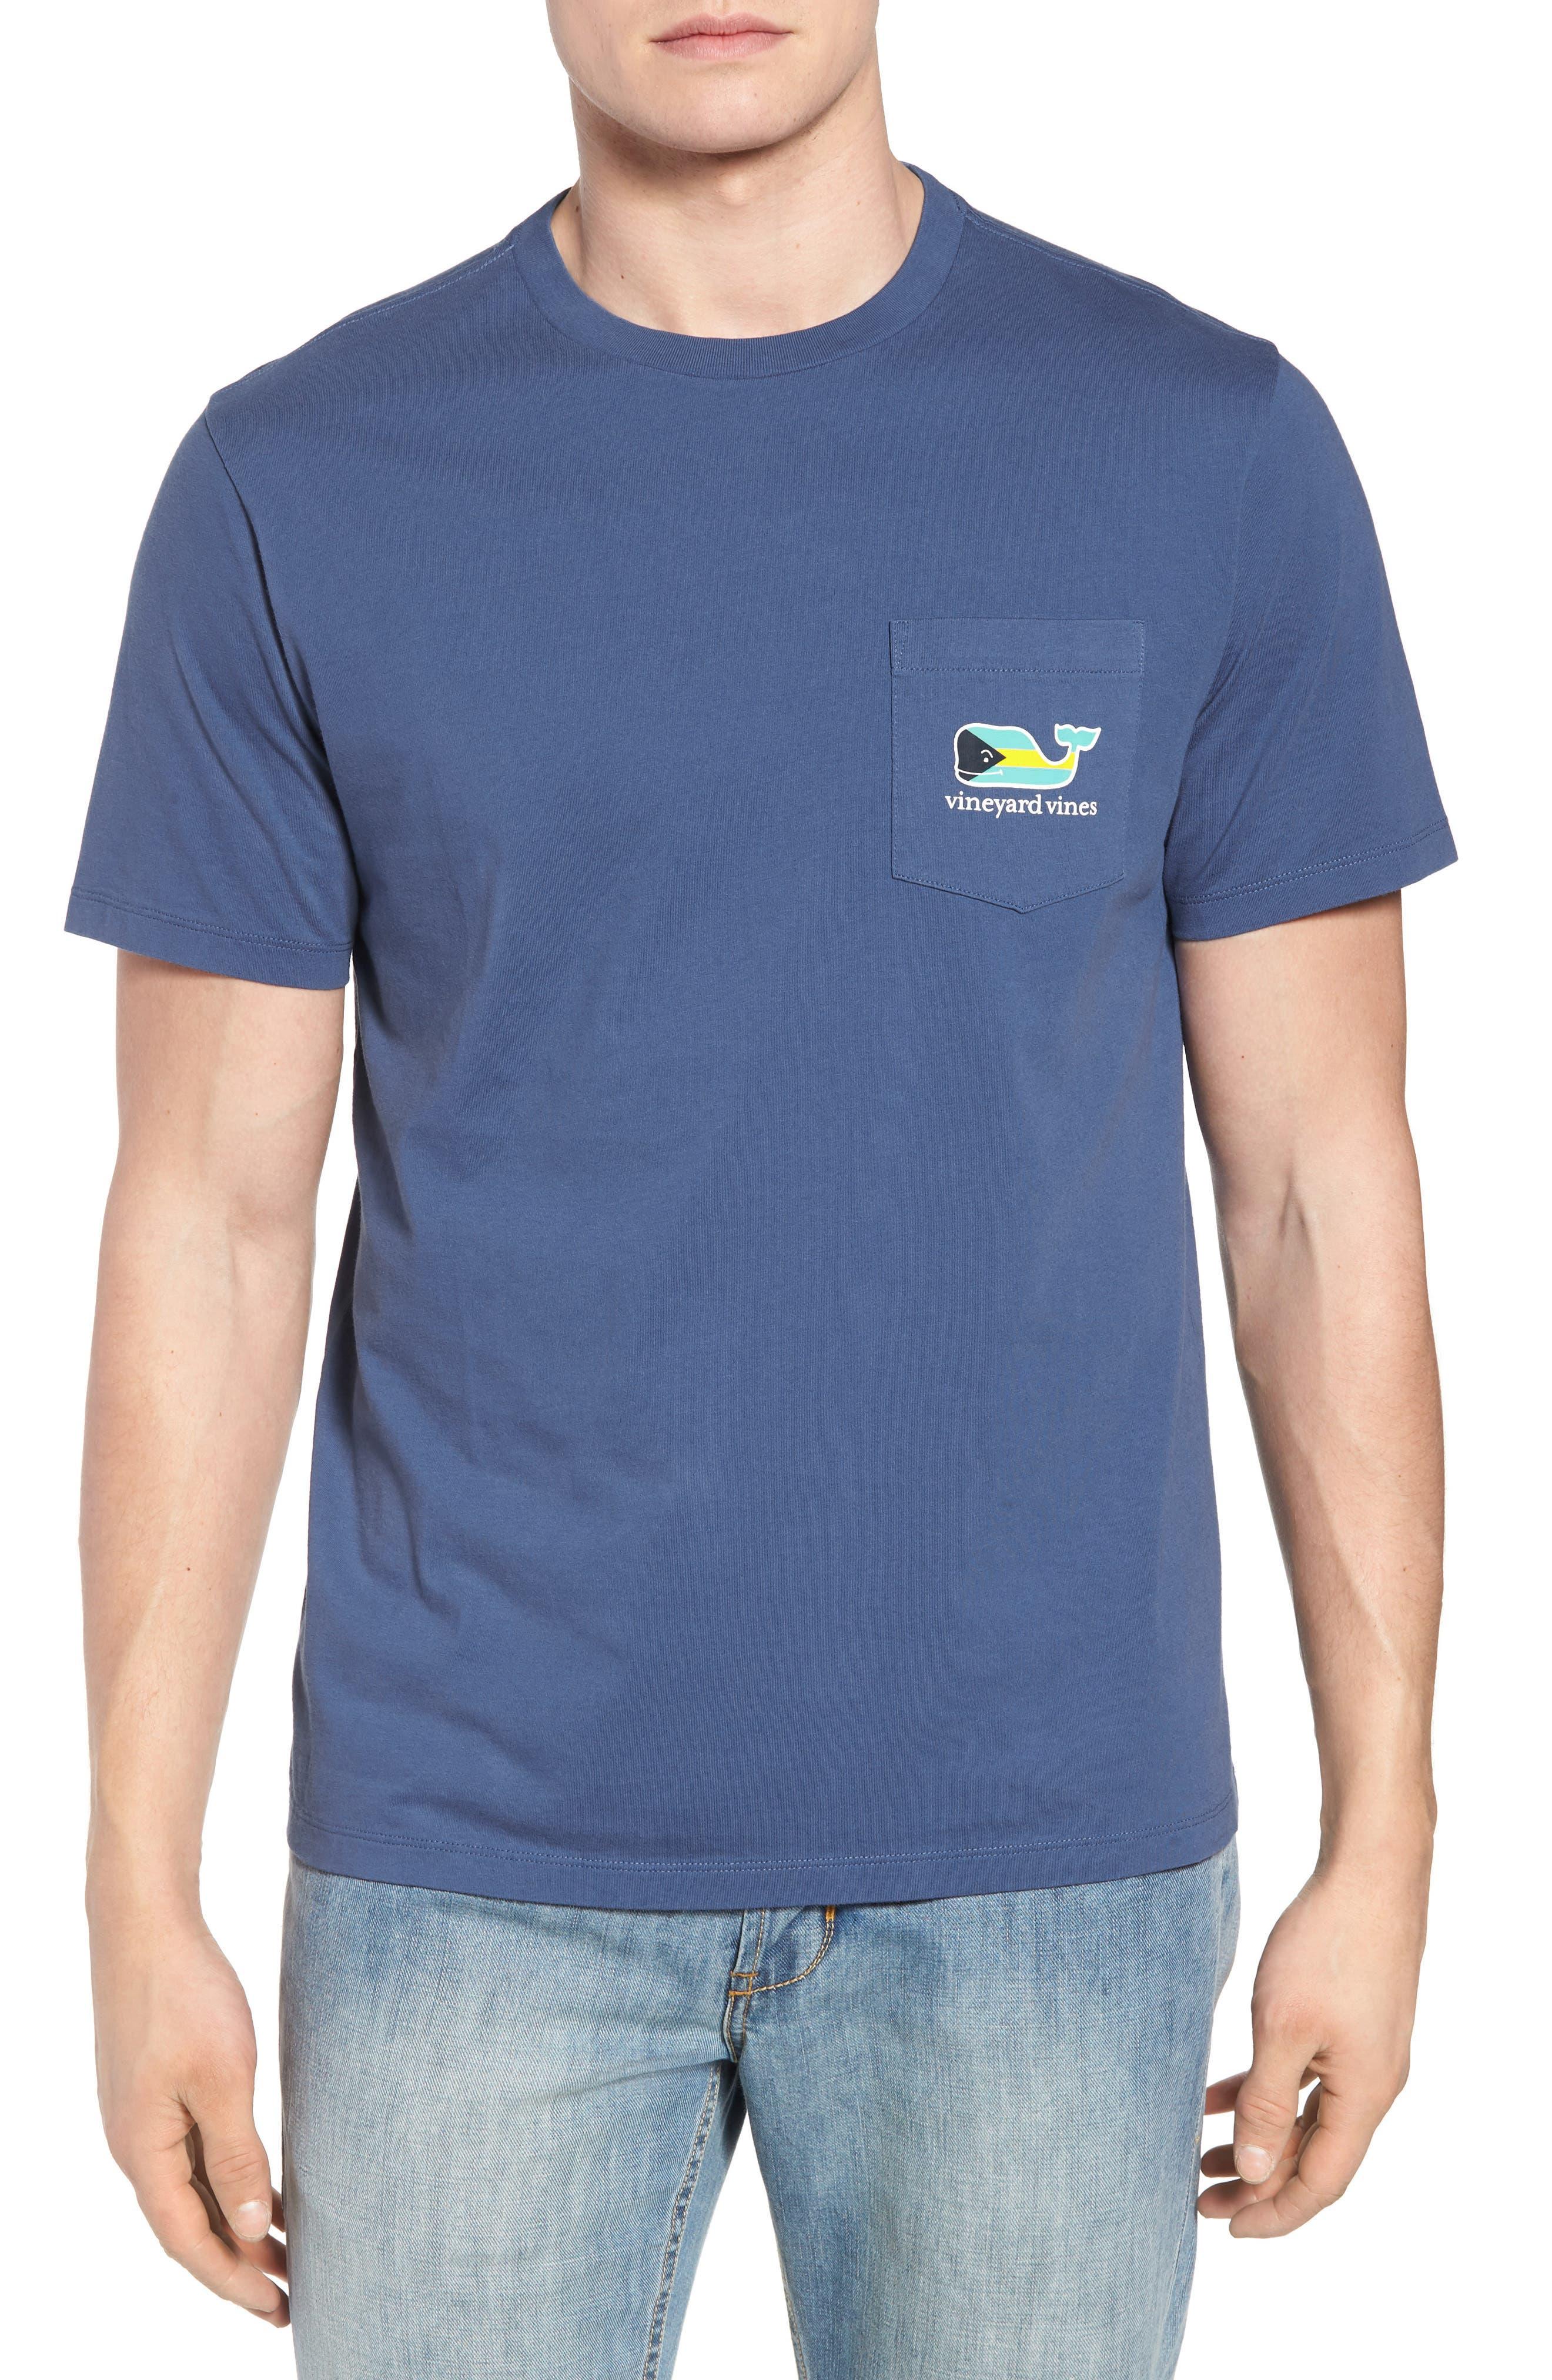 Alternate Image 1 Selected - vineyard vines Bahamas Whale Crewneck Cotton T-Shirt